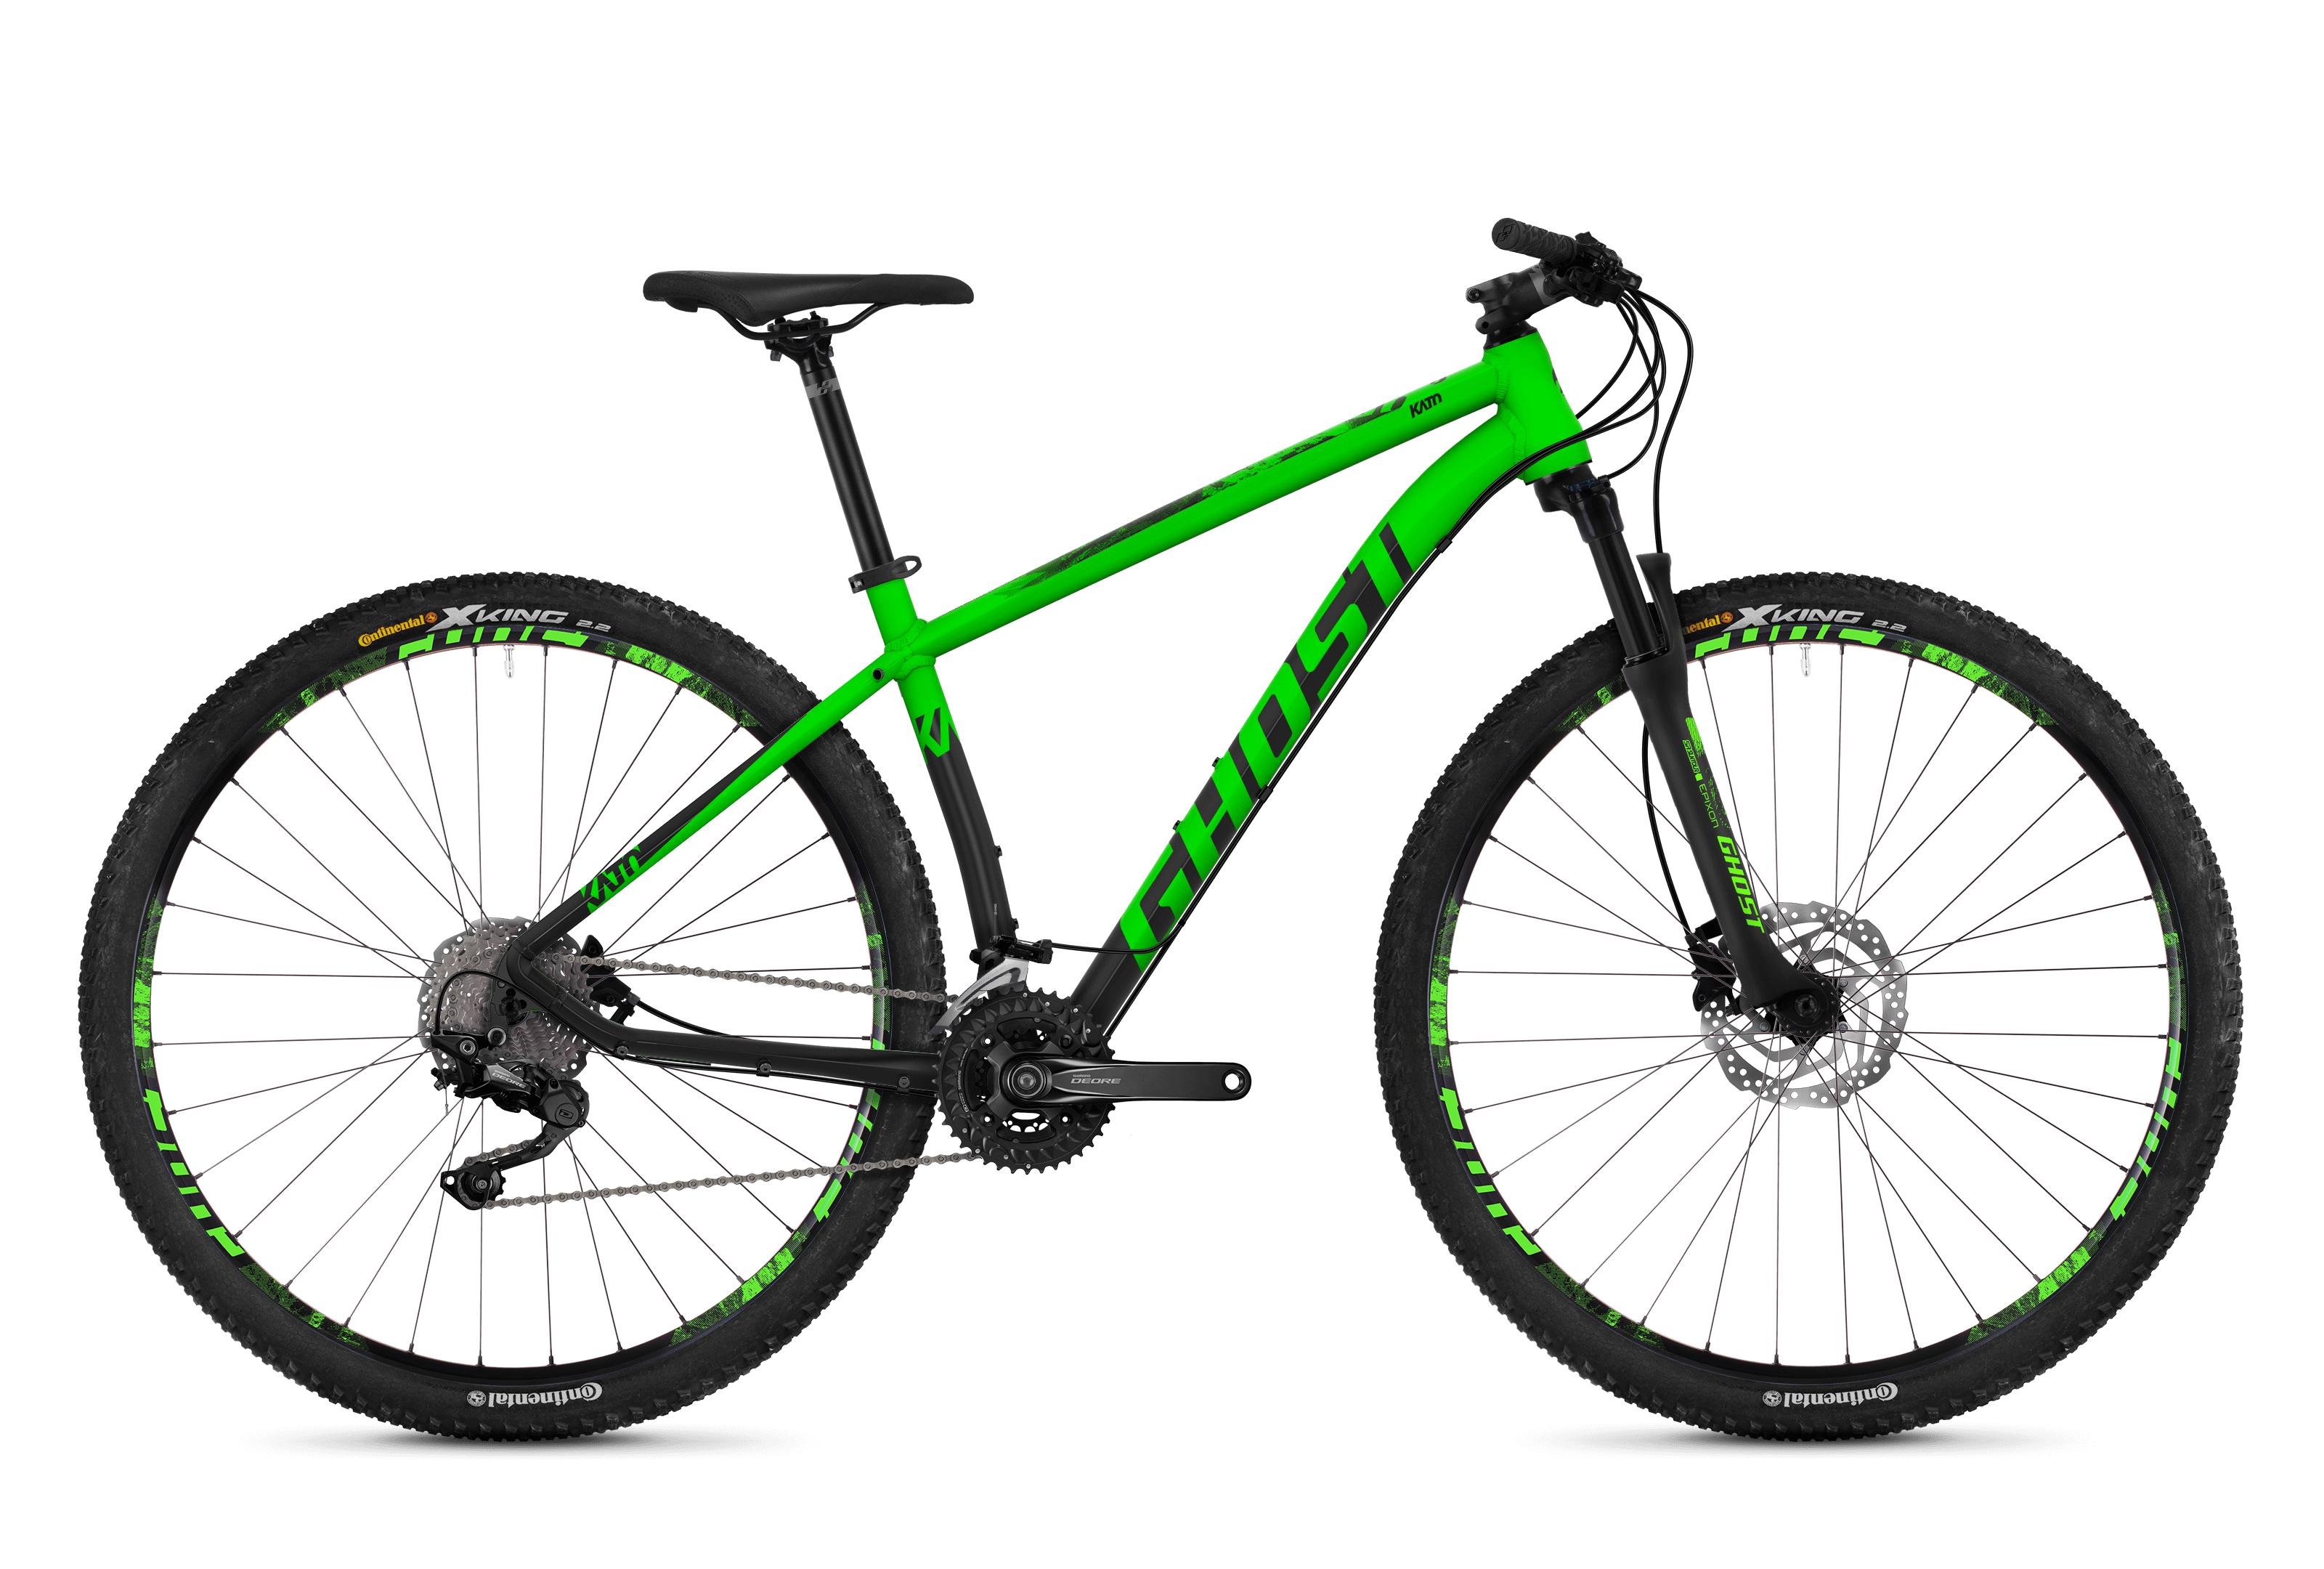 Horské kolo GHOST Kato 6.9 green / black L 2018